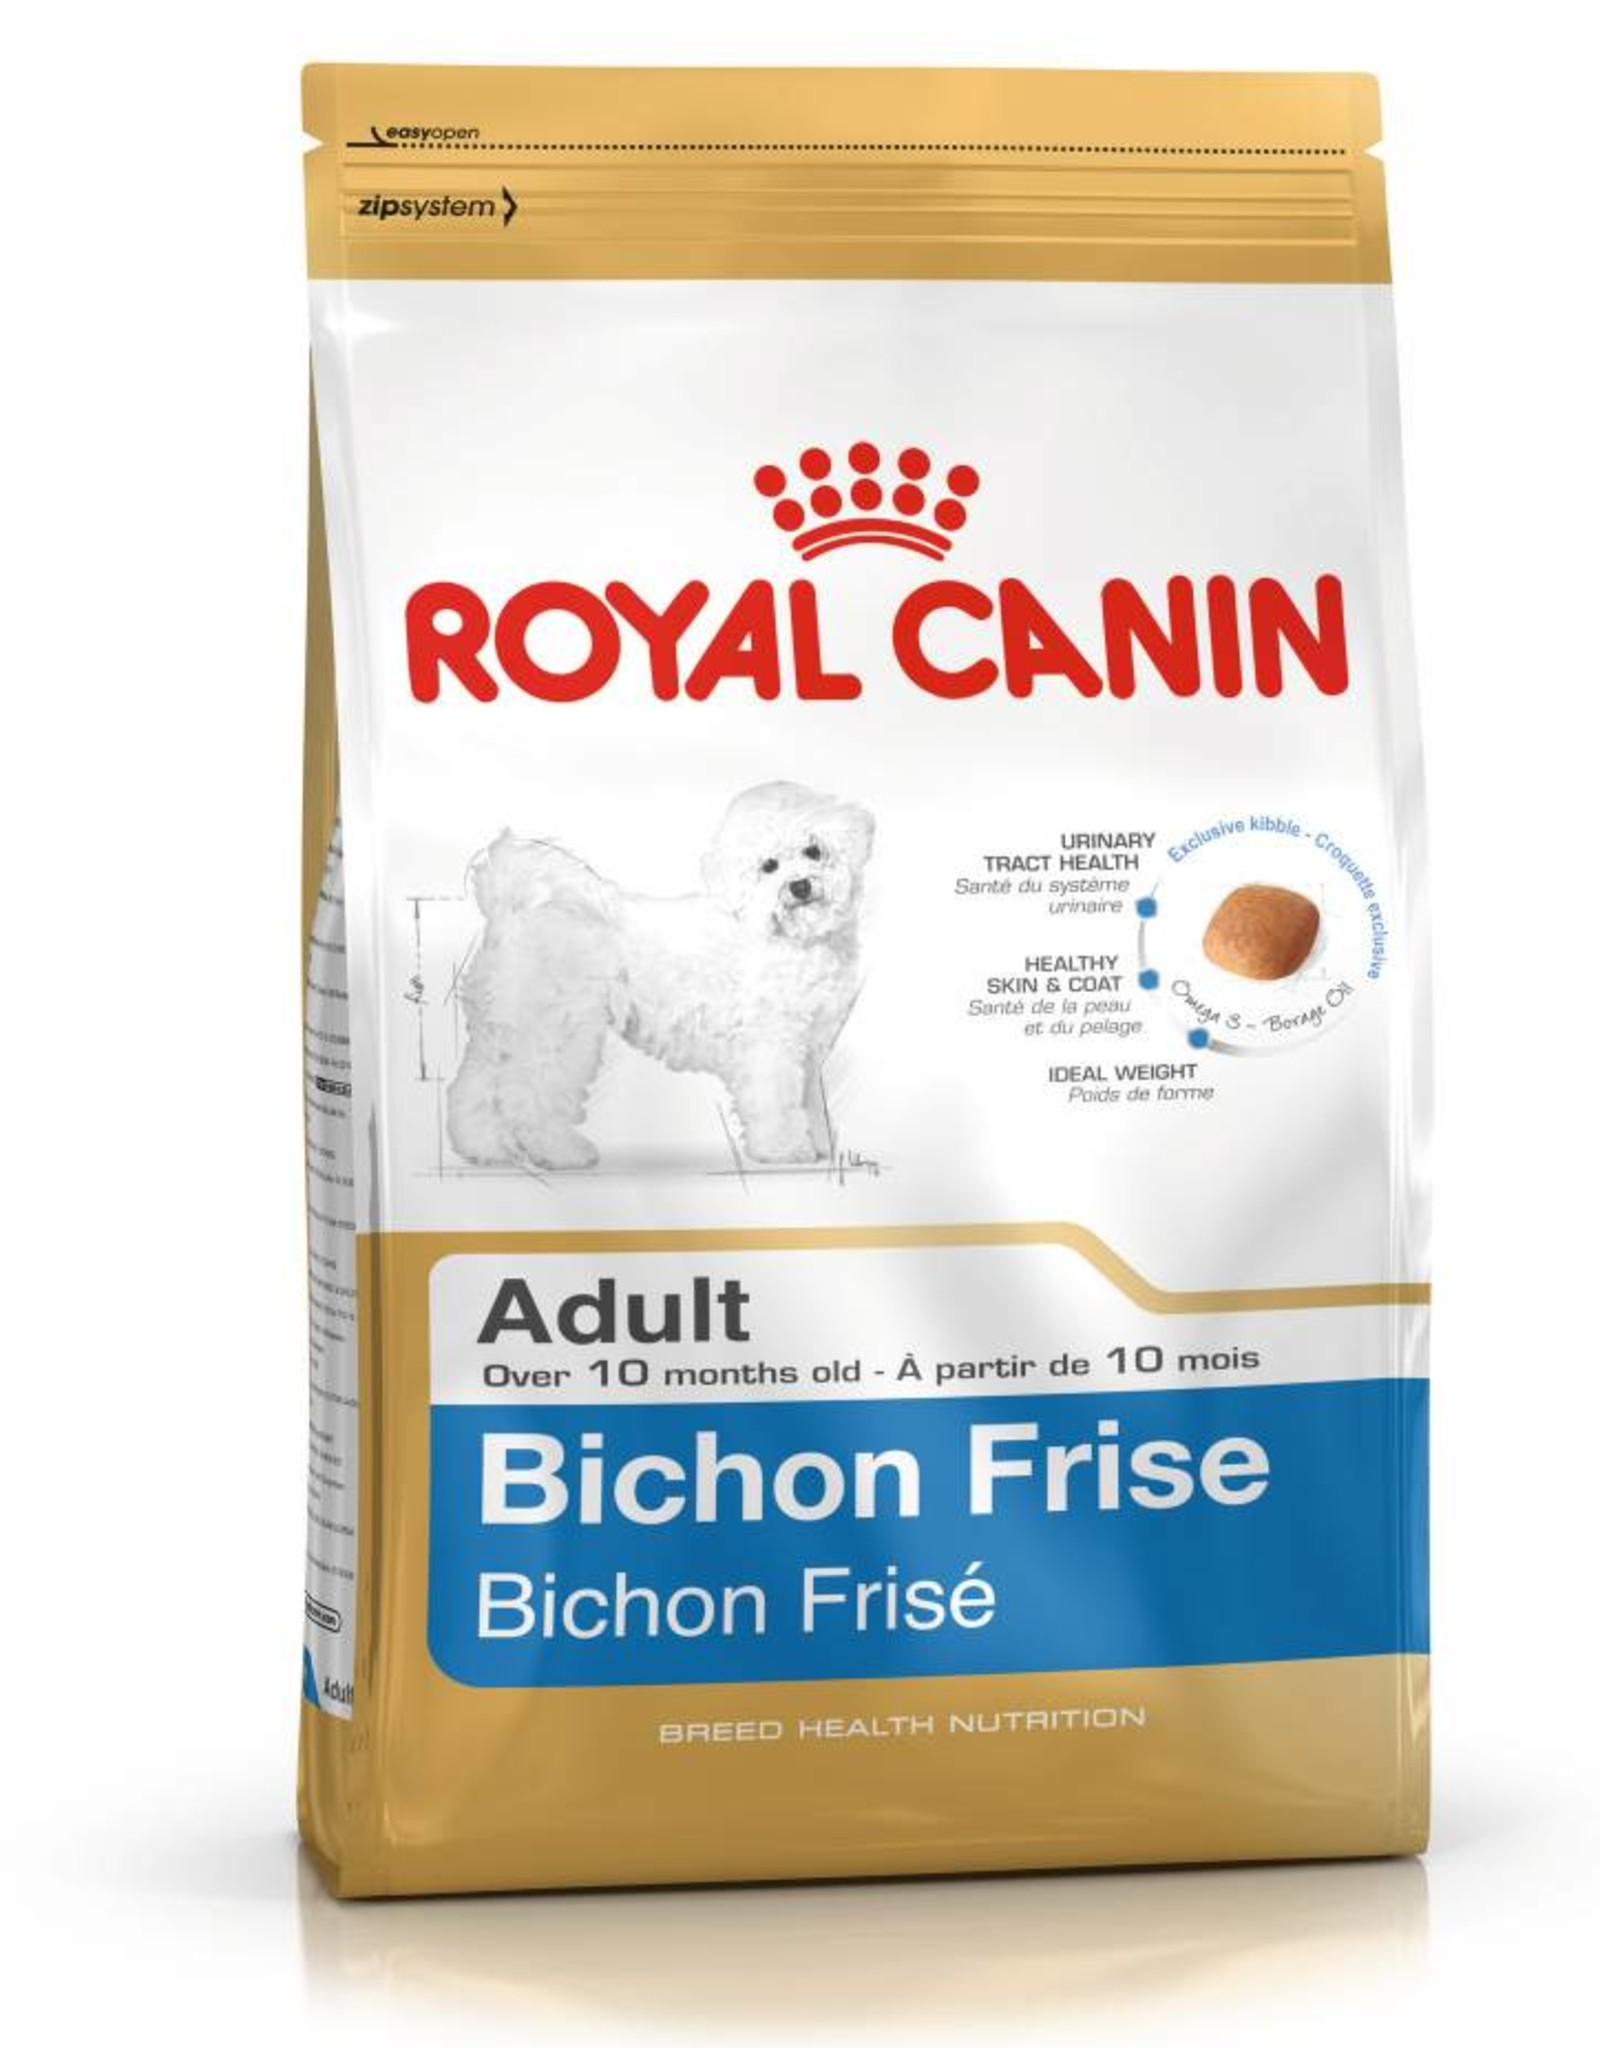 Royal Canin Bichon Frise Dog Food 1.5kg